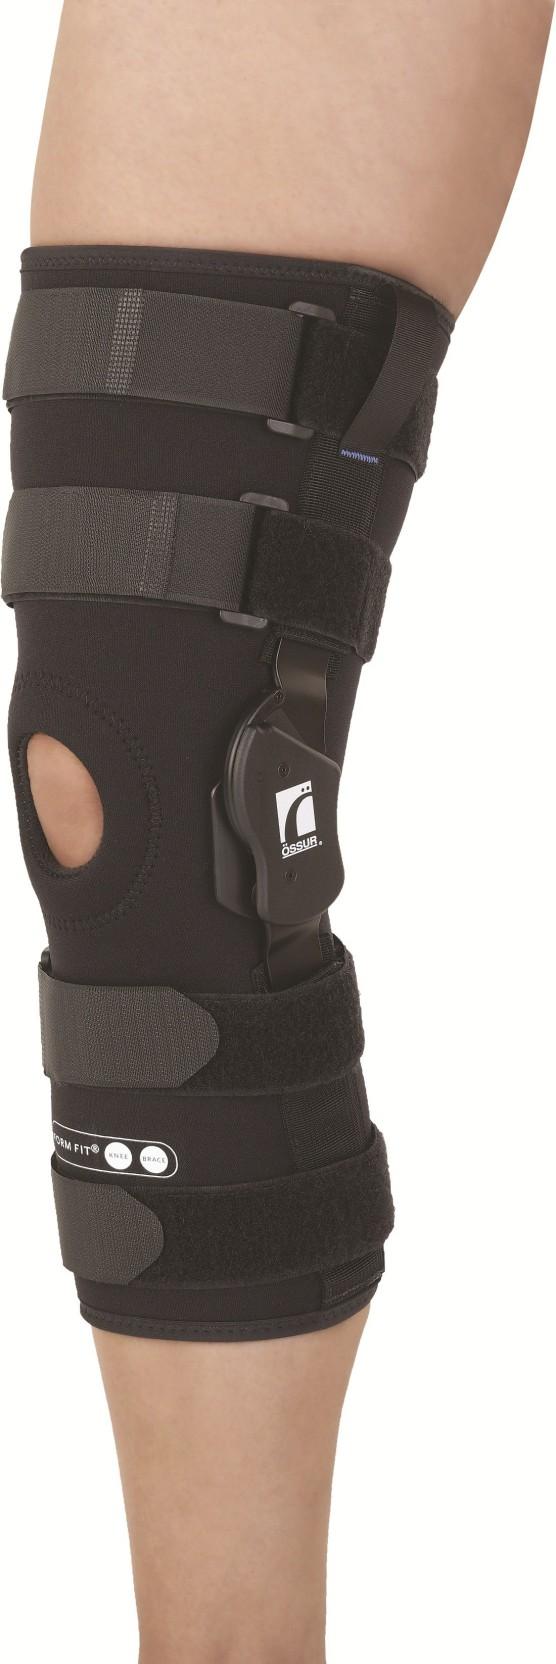 827b3975b7 Össur Form Fit® Knee ROM Brace For Knee Injury Solutions Knee ...